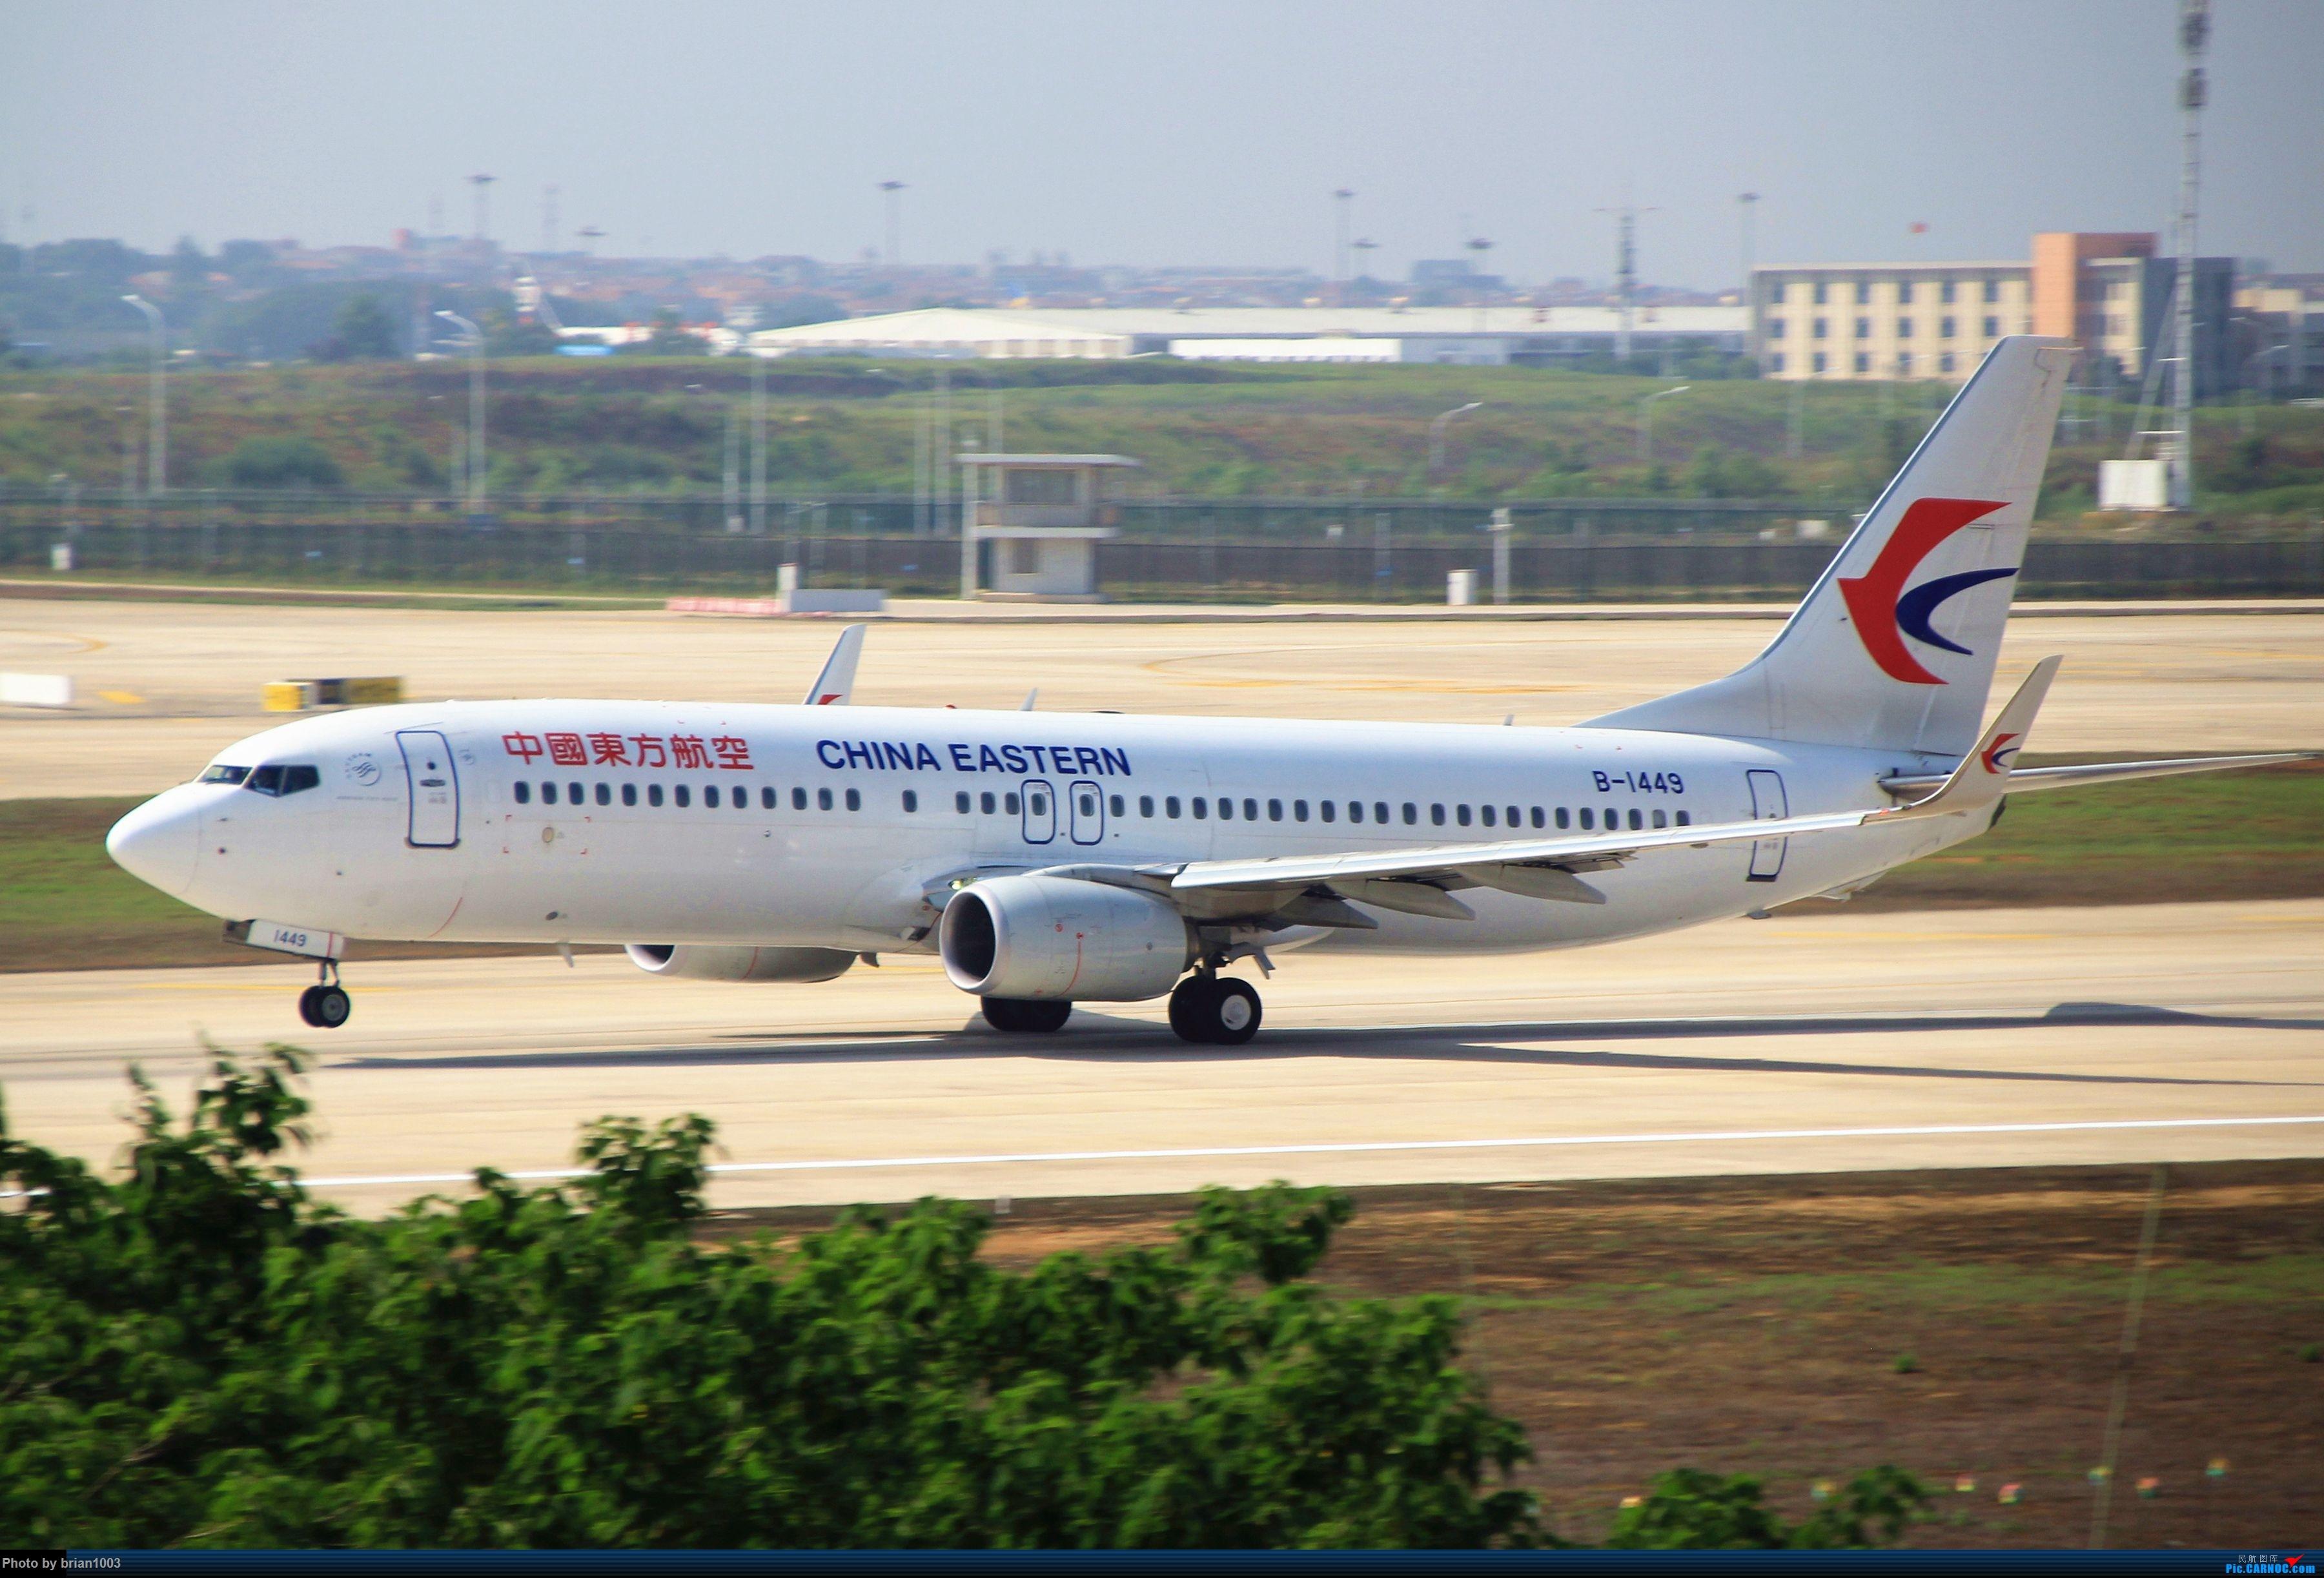 Re:[原创]WUH武汉天河机场拍机之喜迎酷航788和偶遇某其他飞机 BOEING 737-800 B-1449